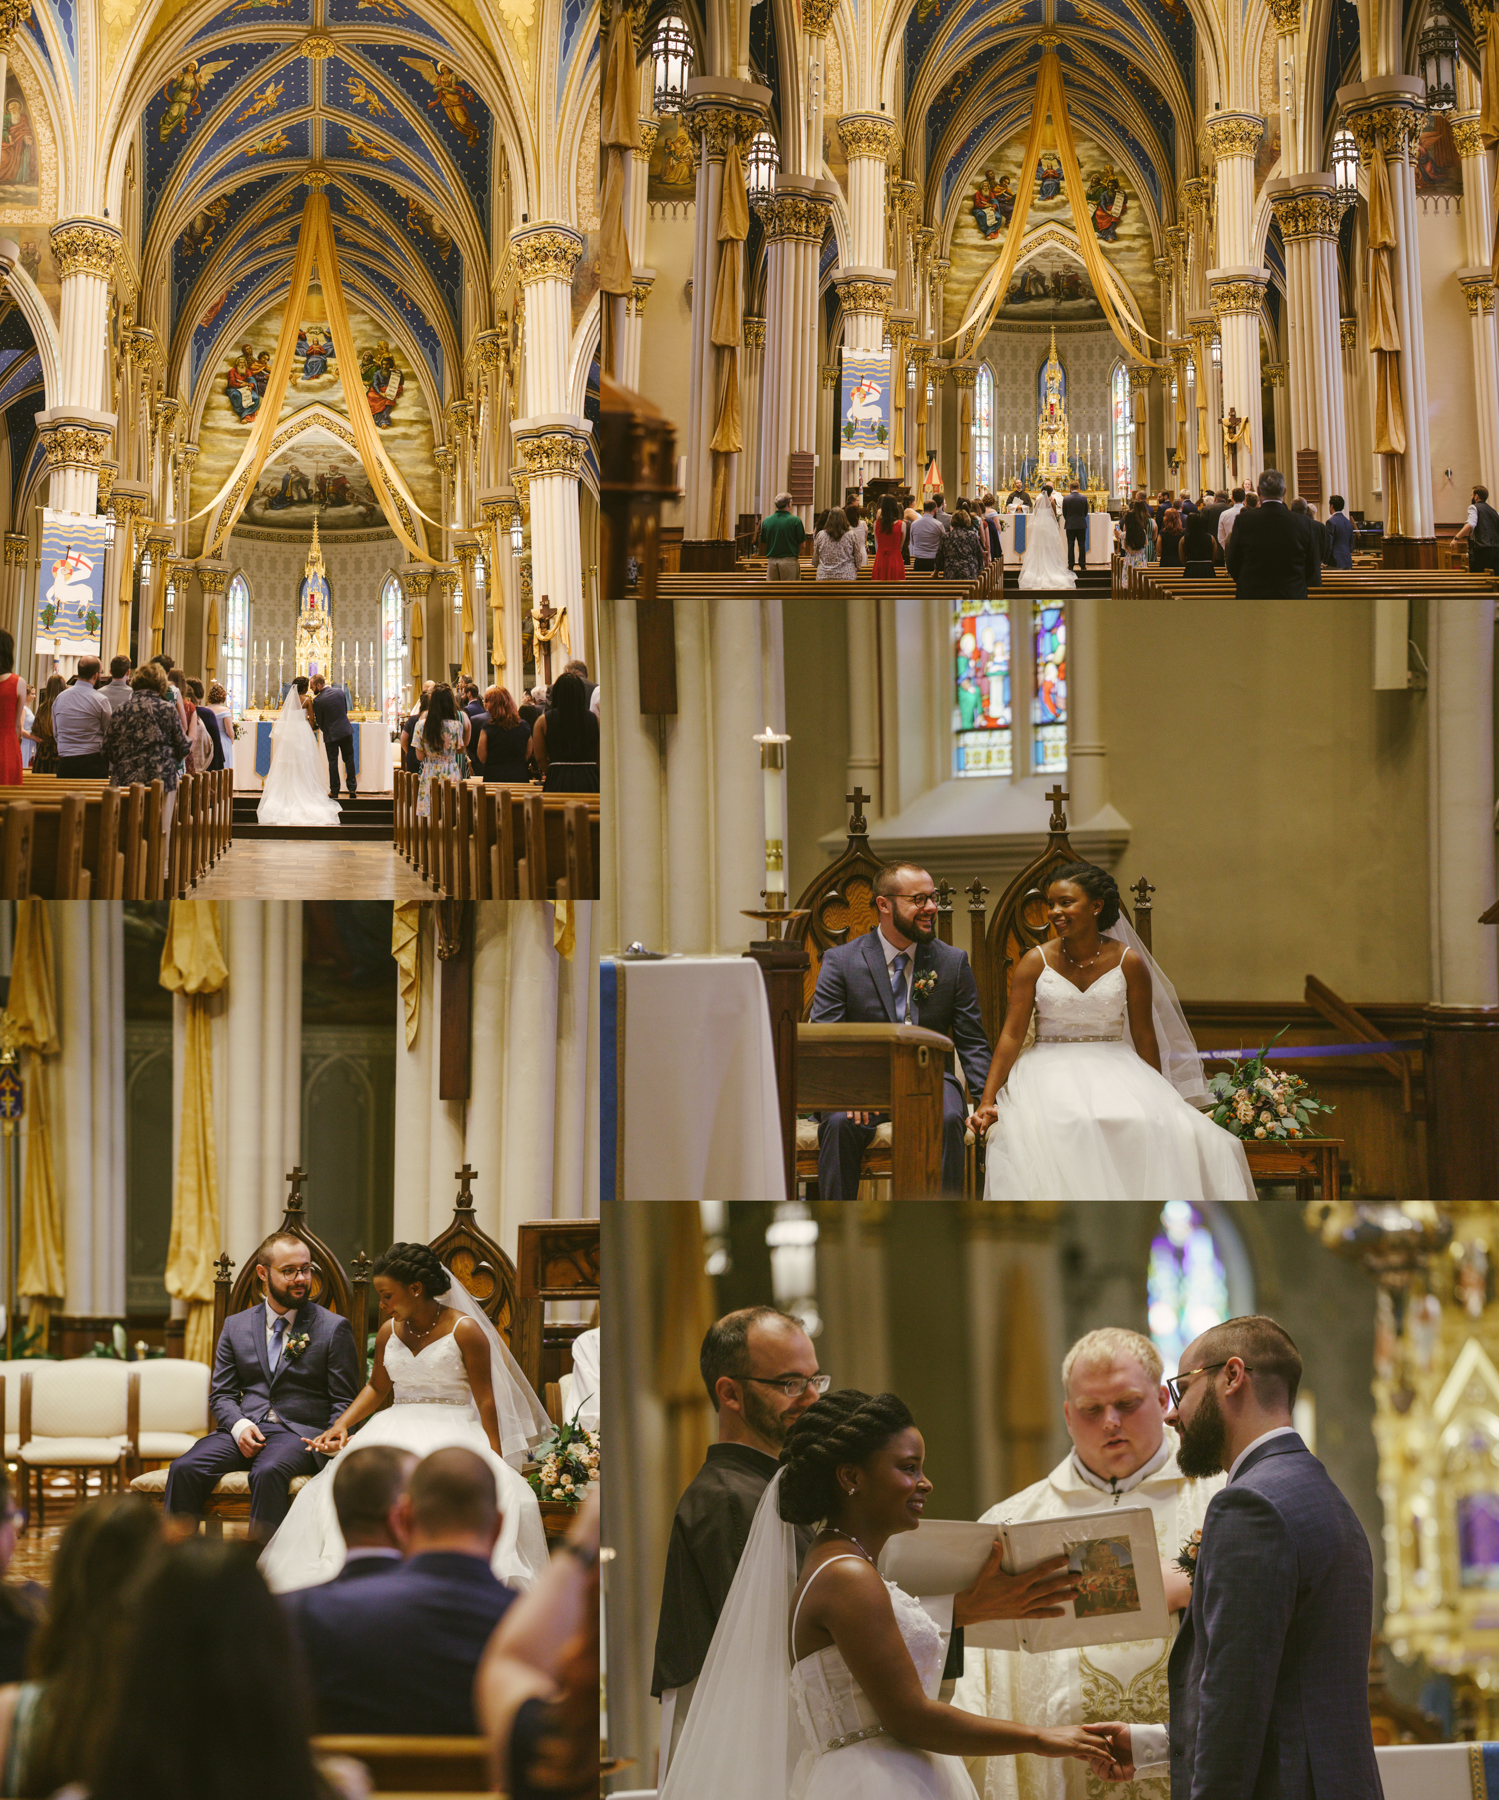 012 may-jimmy-notre-dame-wedding.jpg